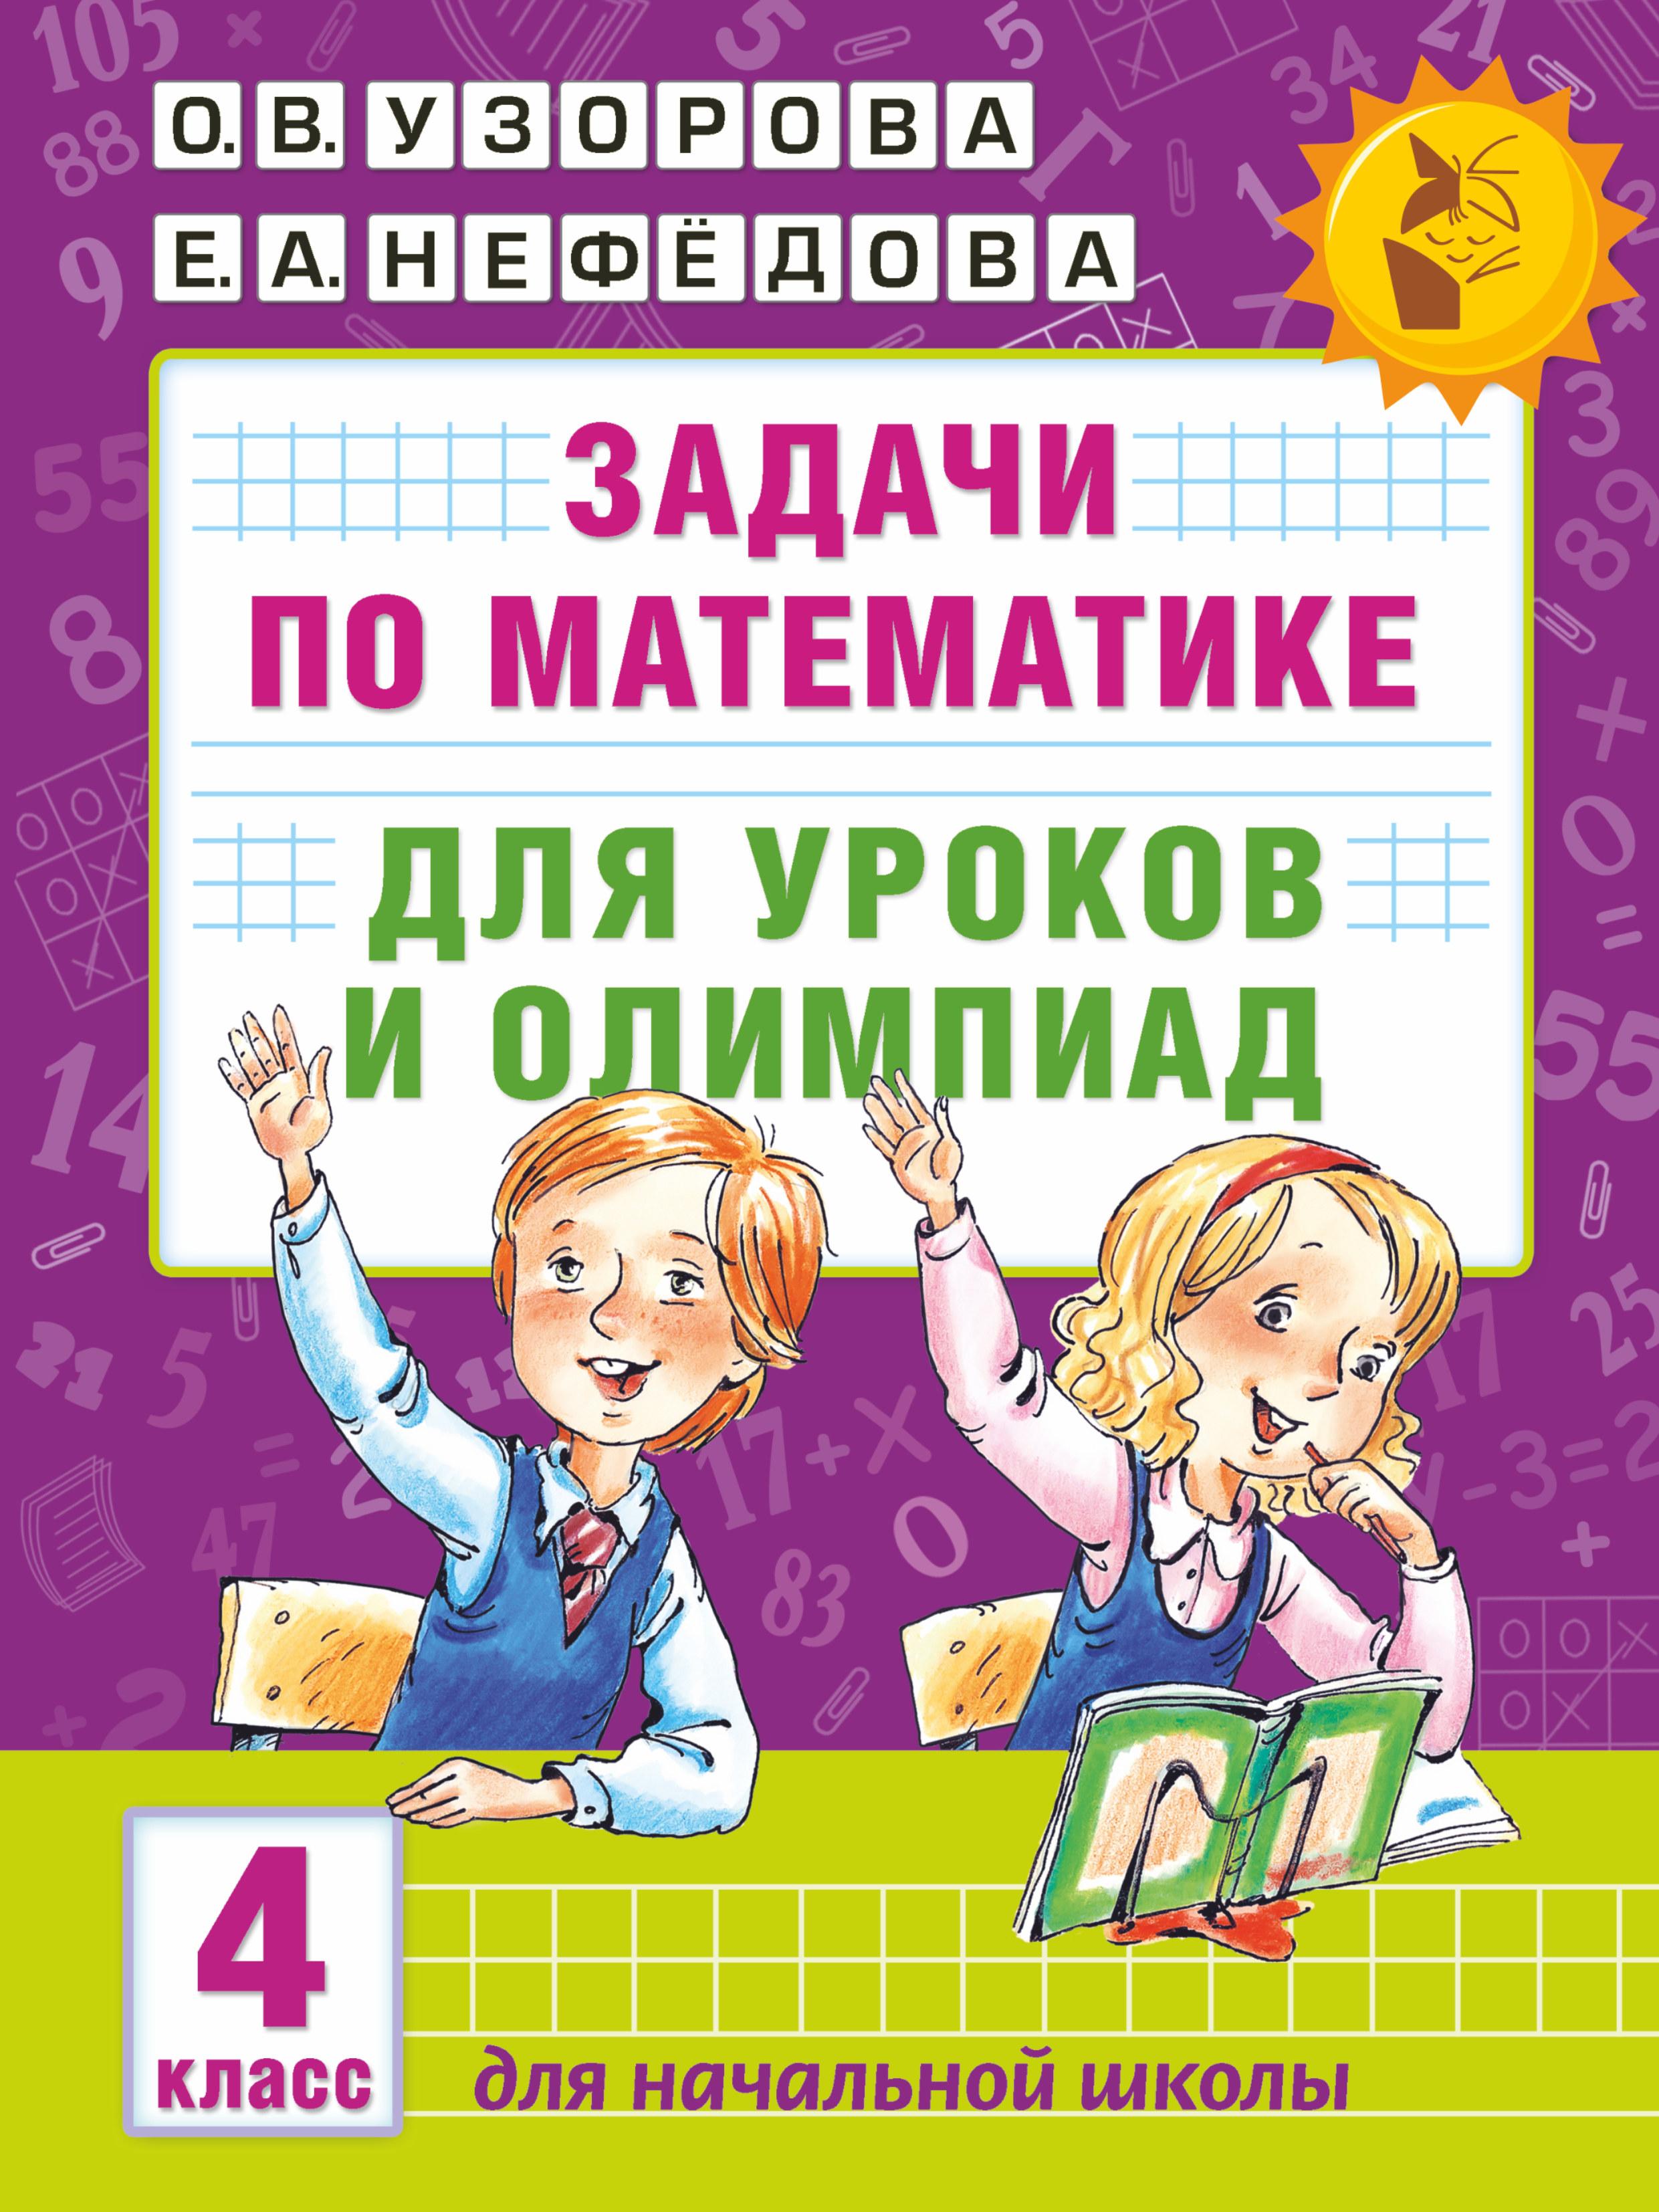 Узорова О.В., Нефедова Е.А. Задачи по математике для уроков и олимпиад. 4 класс